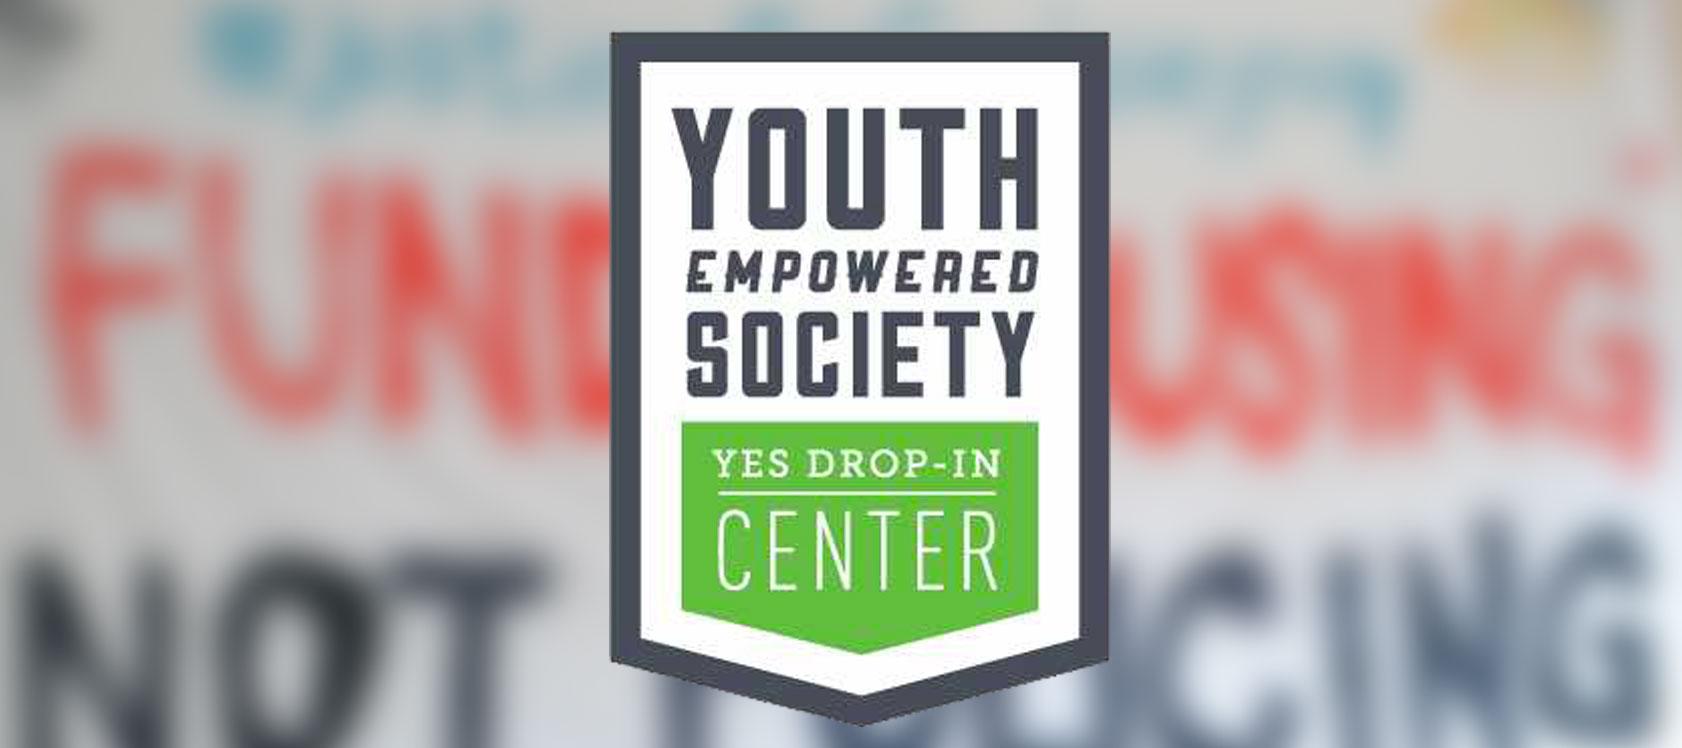 Youth Empowered Society Logo